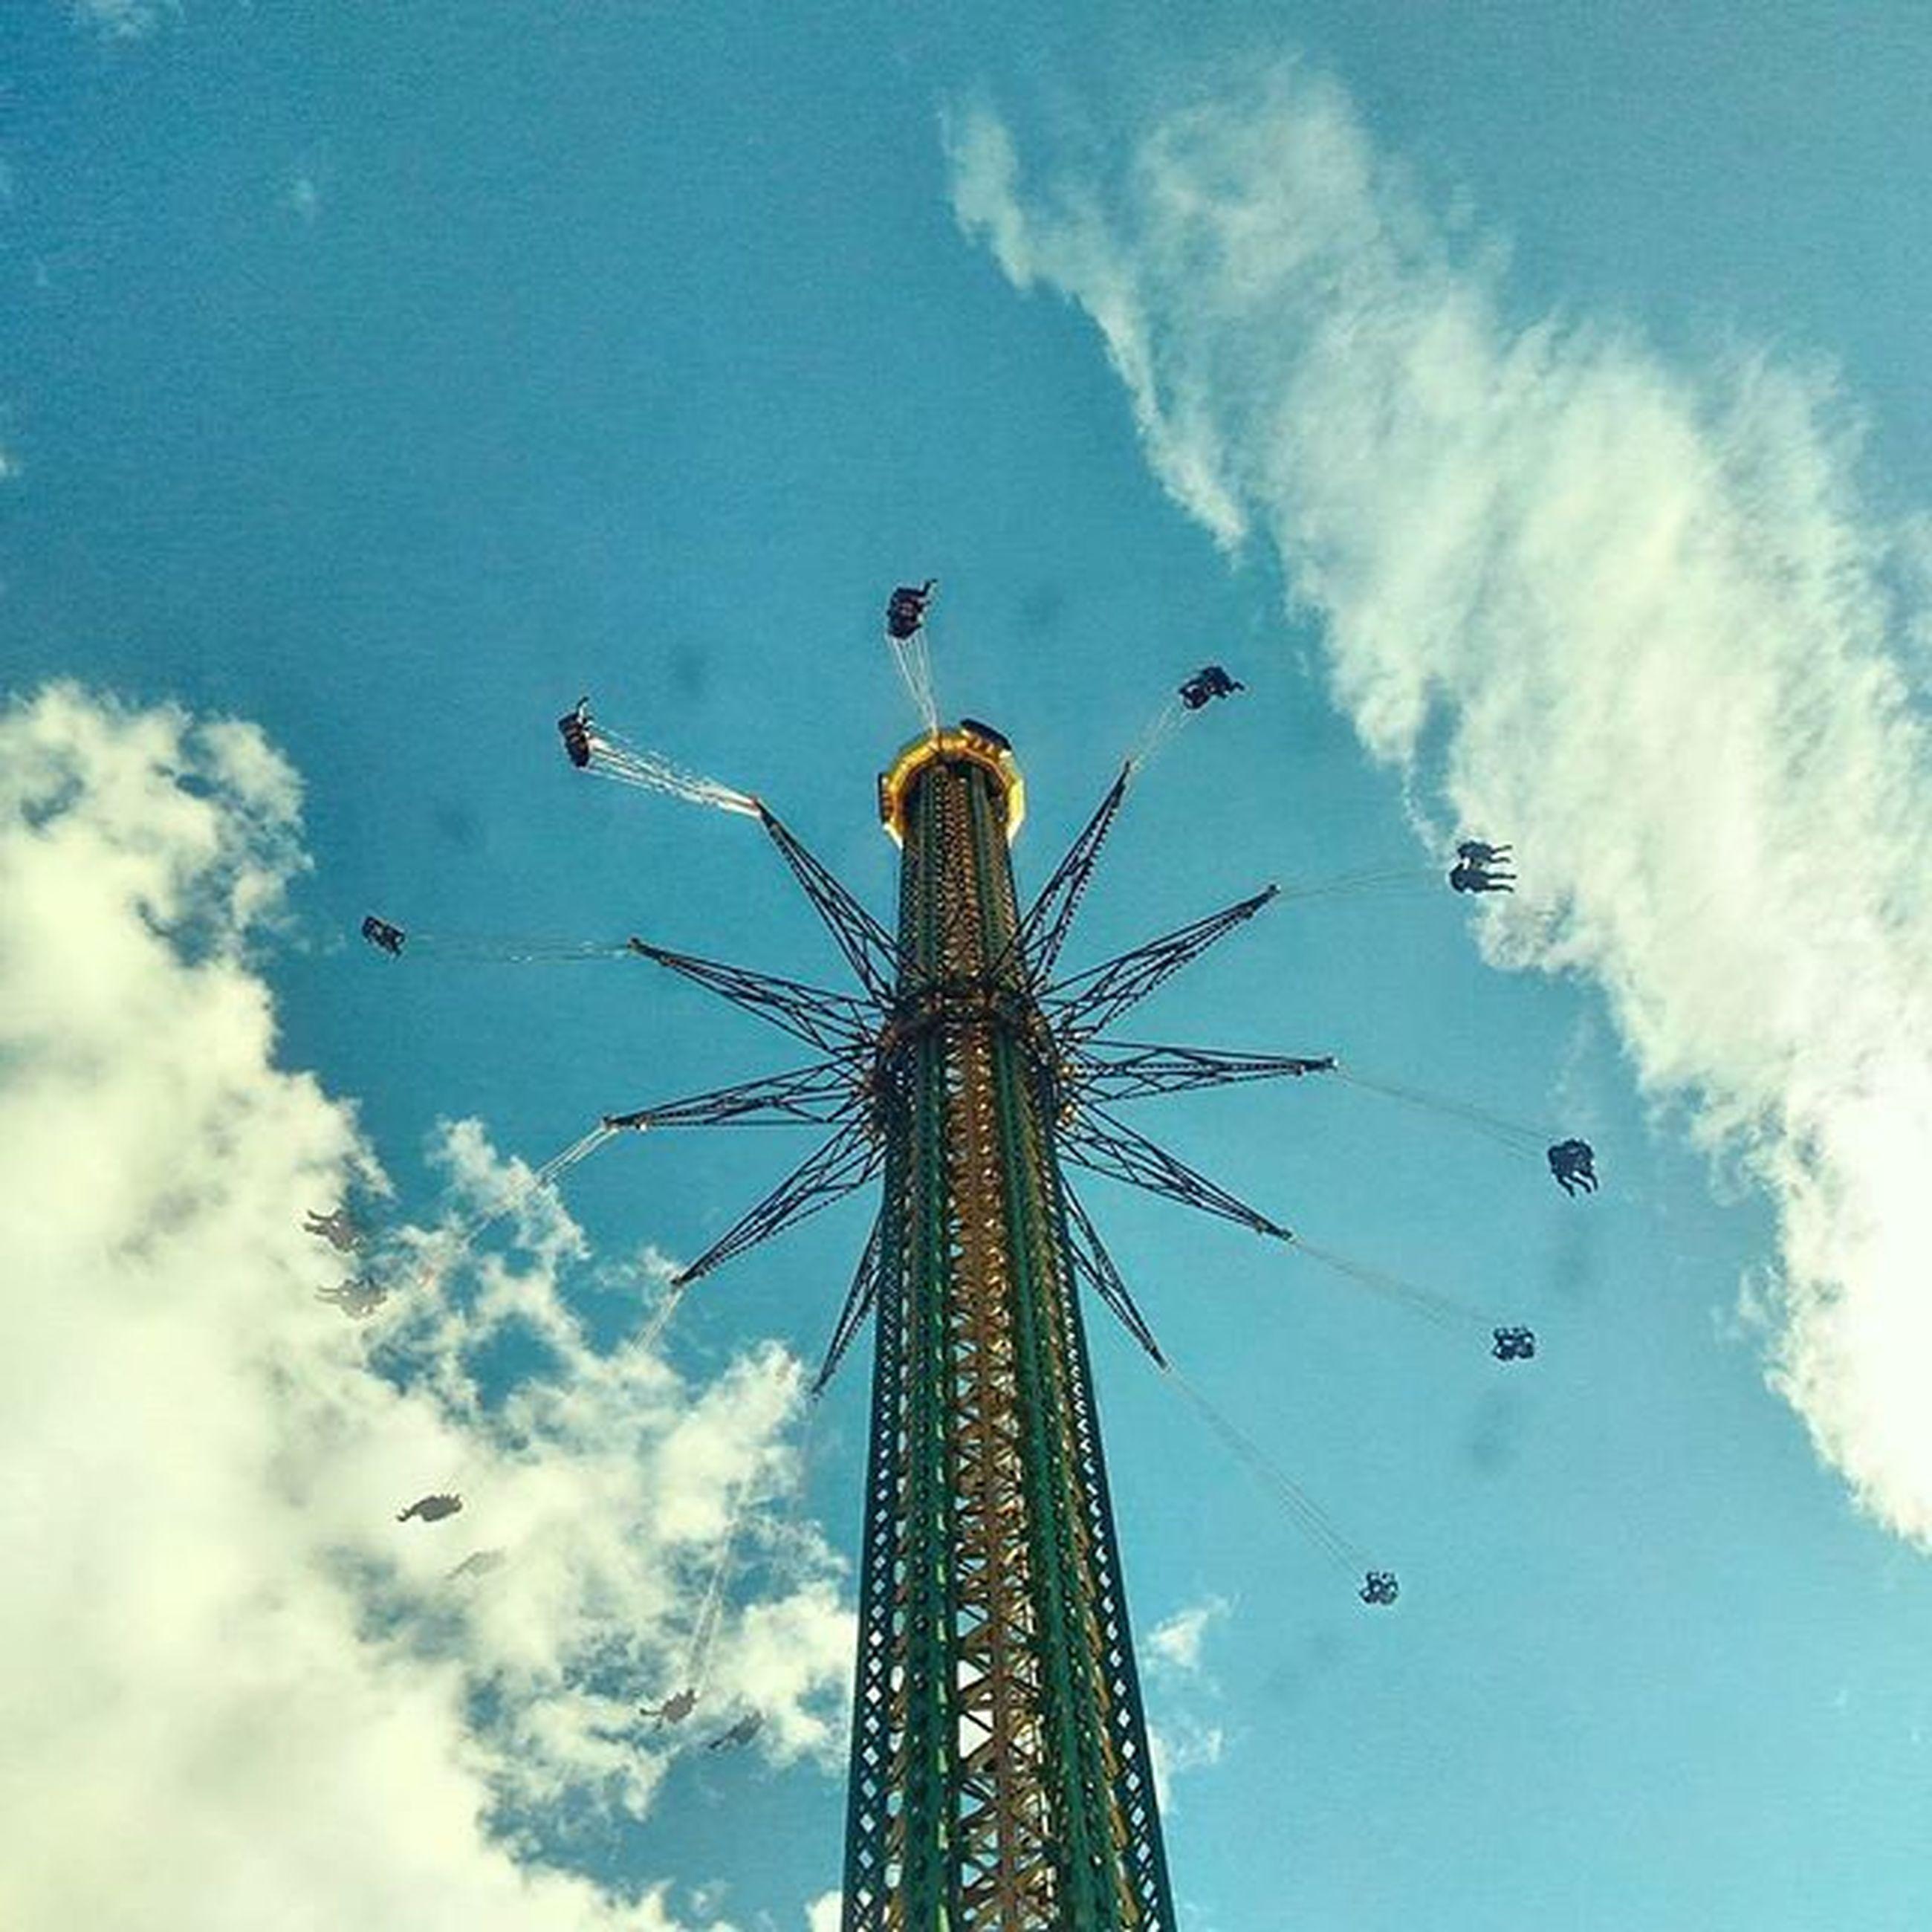 low angle view, amusement park, amusement park ride, arts culture and entertainment, sky, ferris wheel, cloud - sky, chain swing ride, fun, enjoyment, built structure, cloudy, tall - high, cloud, architecture, leisure activity, fairground ride, traveling carnival, outdoors, blue